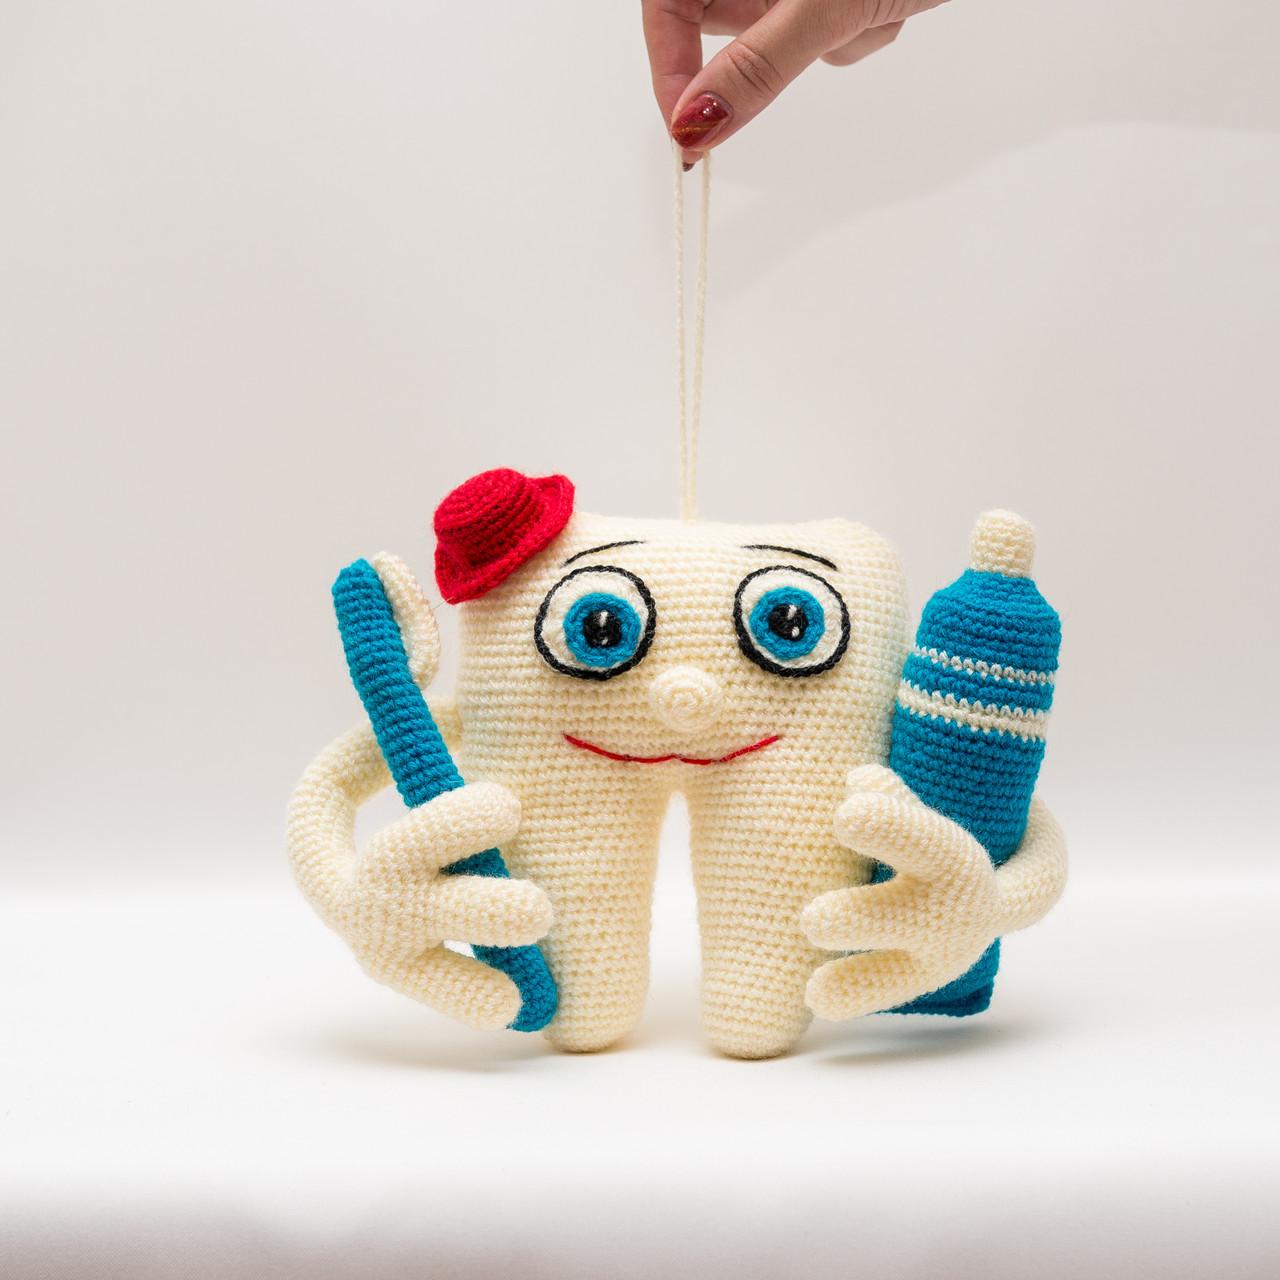 Зуб стоматолог  Vikamade вязанные игрушки от Танюшки